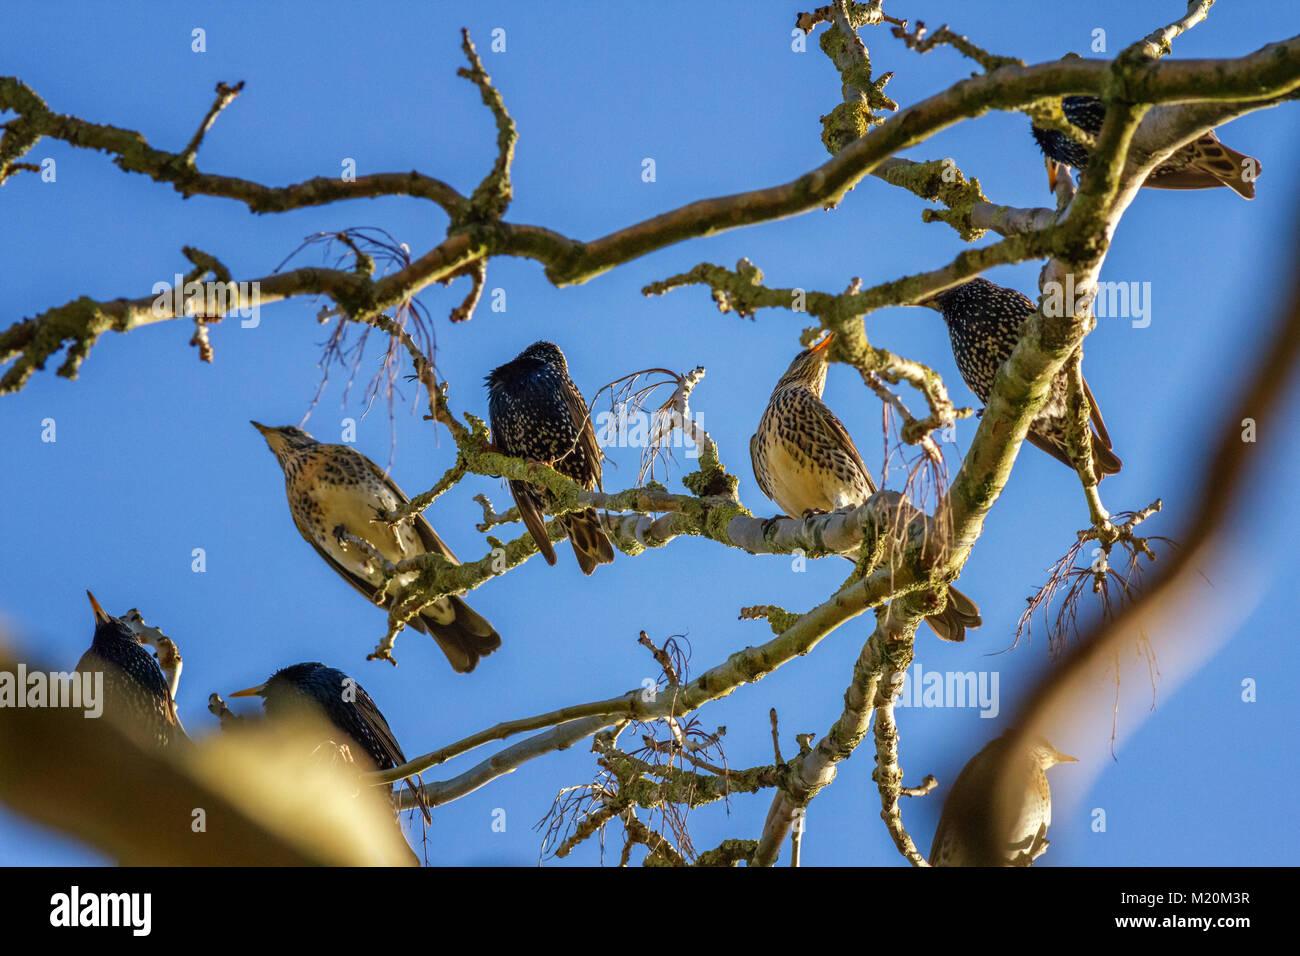 UK wildlife: Mixed flock of common starlings (Sturnus vulgaris) and fieldfares (Turdus pilaris) perched in a tree - Stock Image